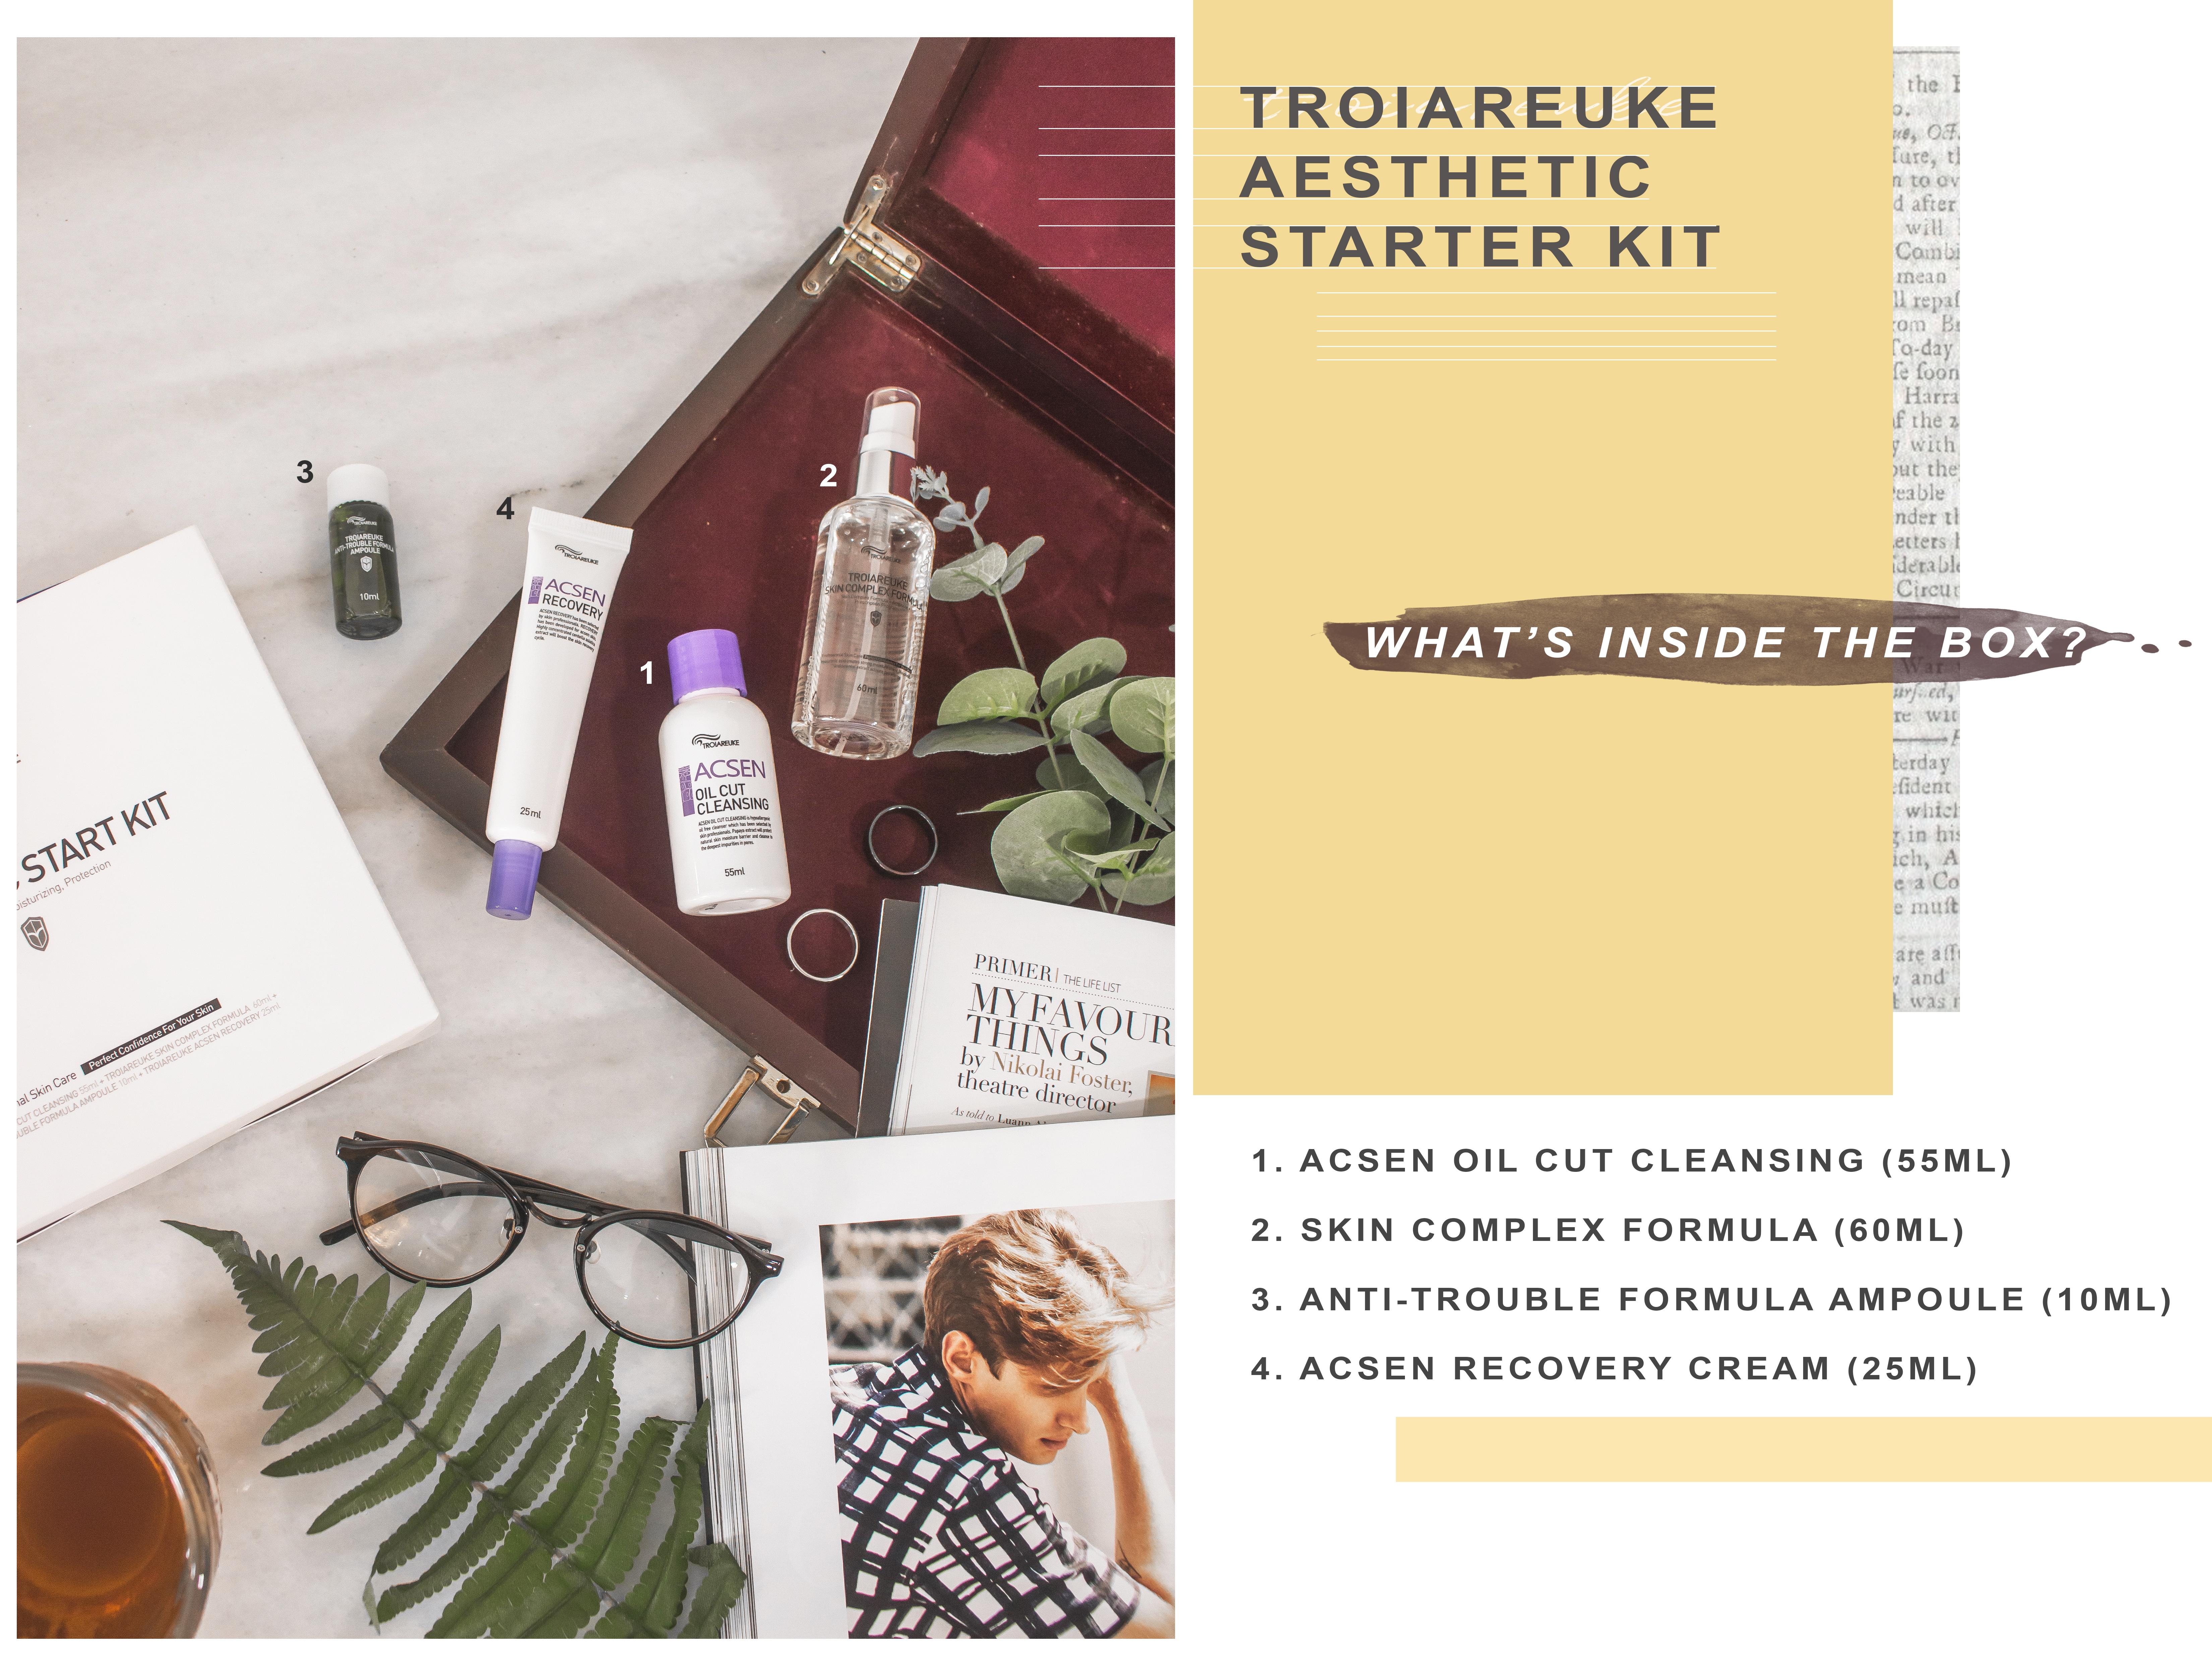 troiareuke aesthetic starter kit_1